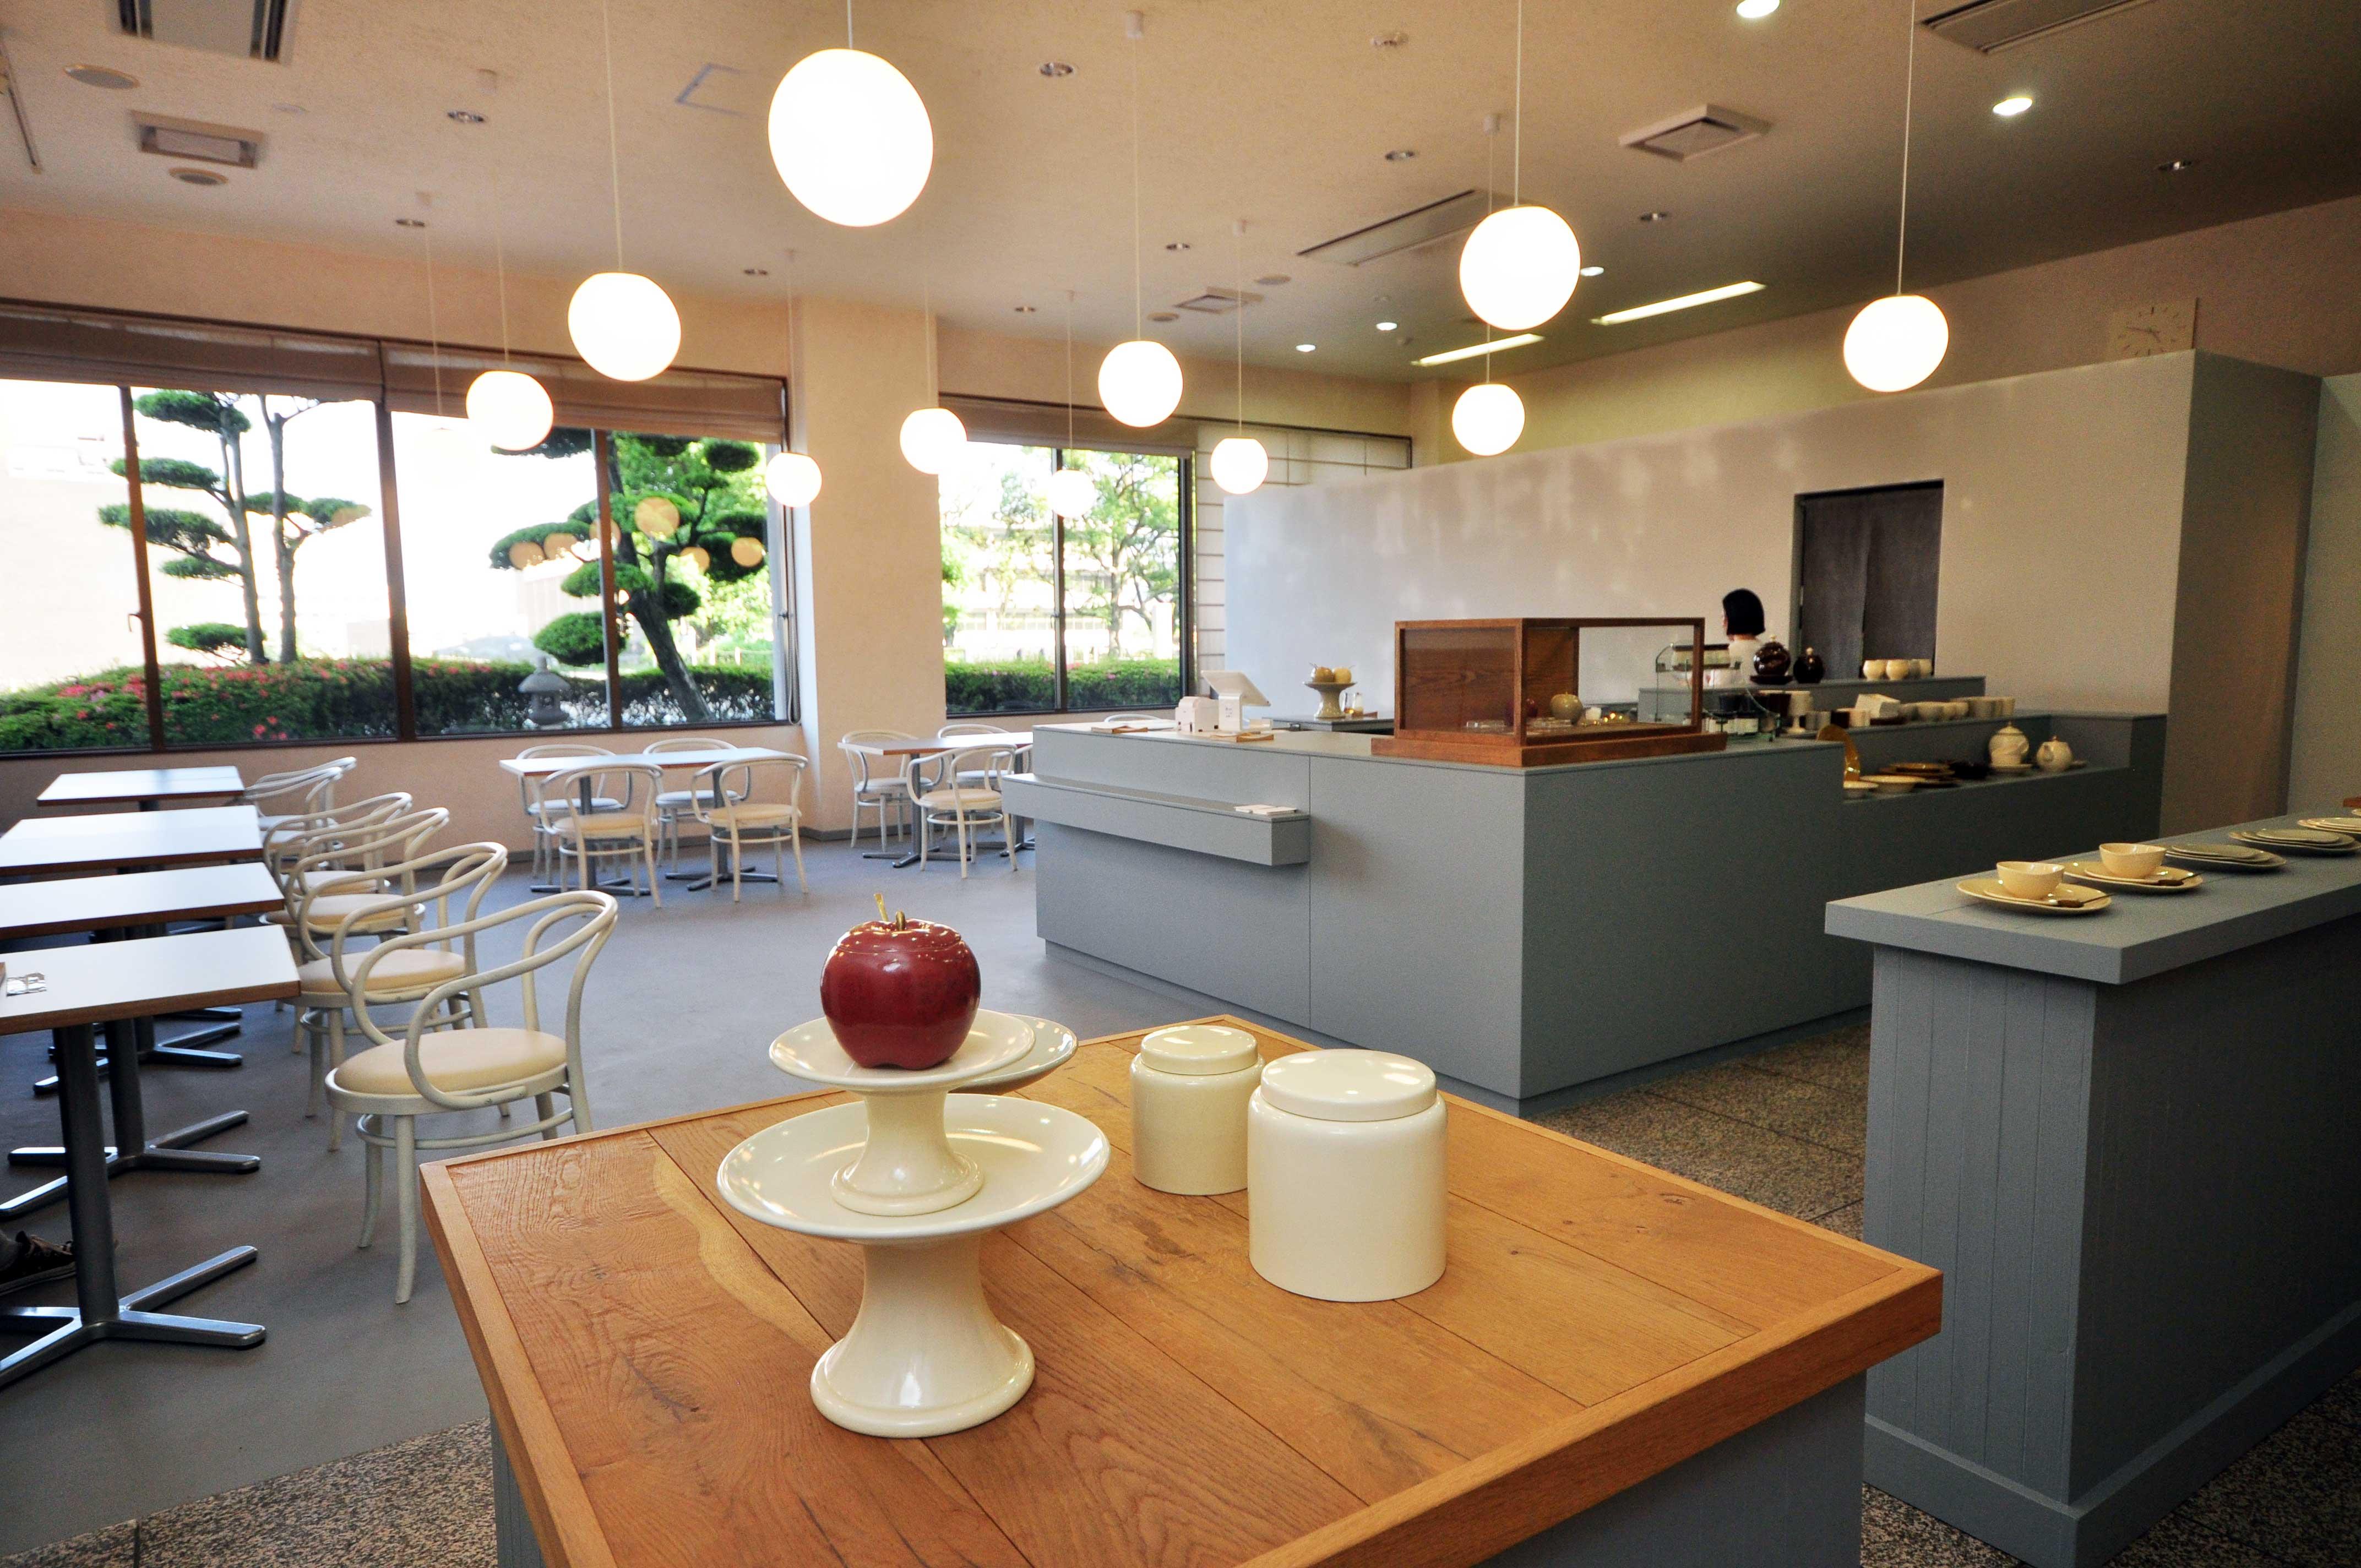 【CHIN JUKAN POTTERY 喫茶室】黎明館内にオープン!薩摩焼の器で鹿児島の美味しいものを